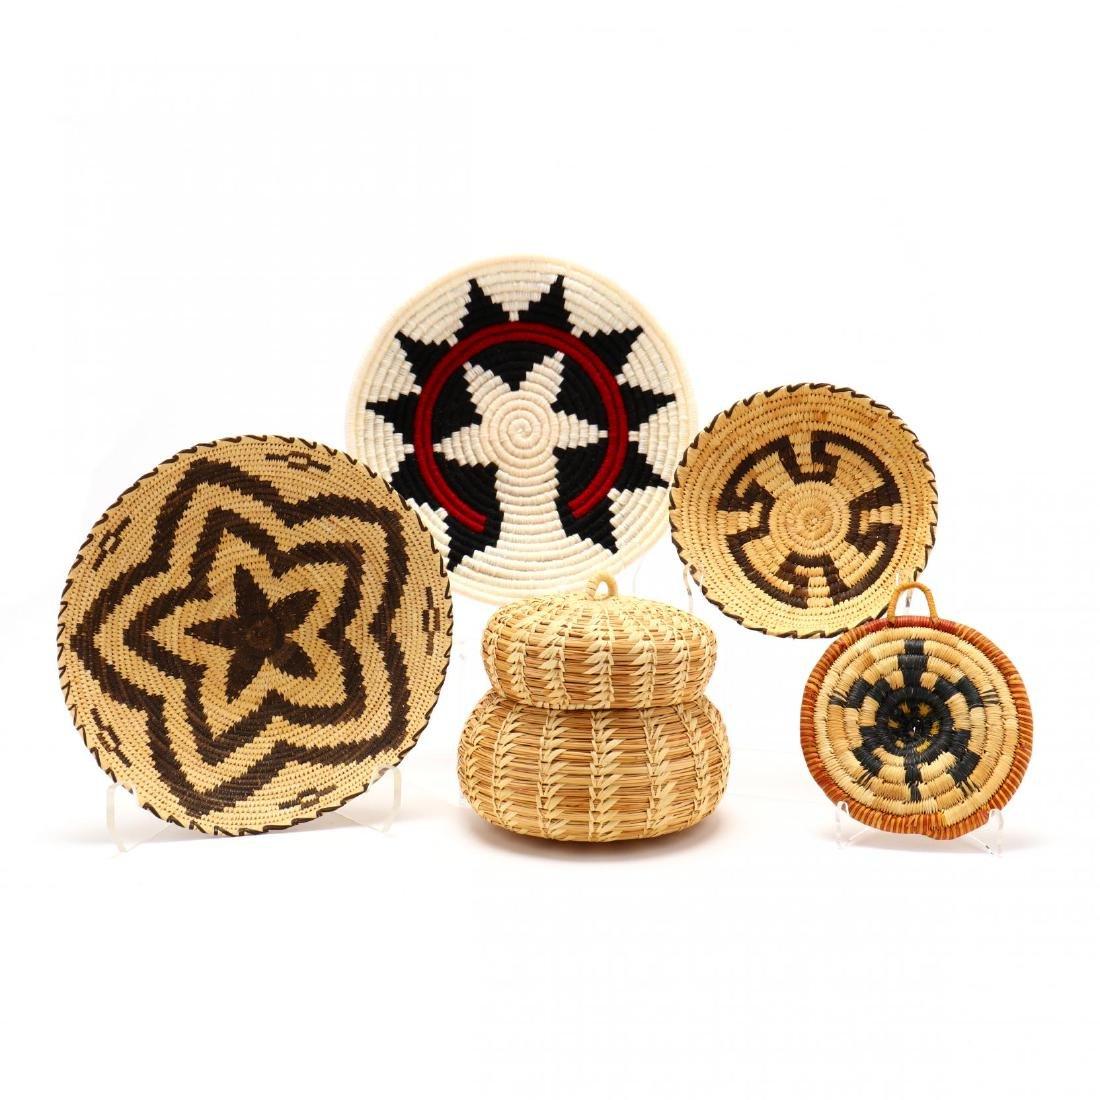 Five Native American Baskets